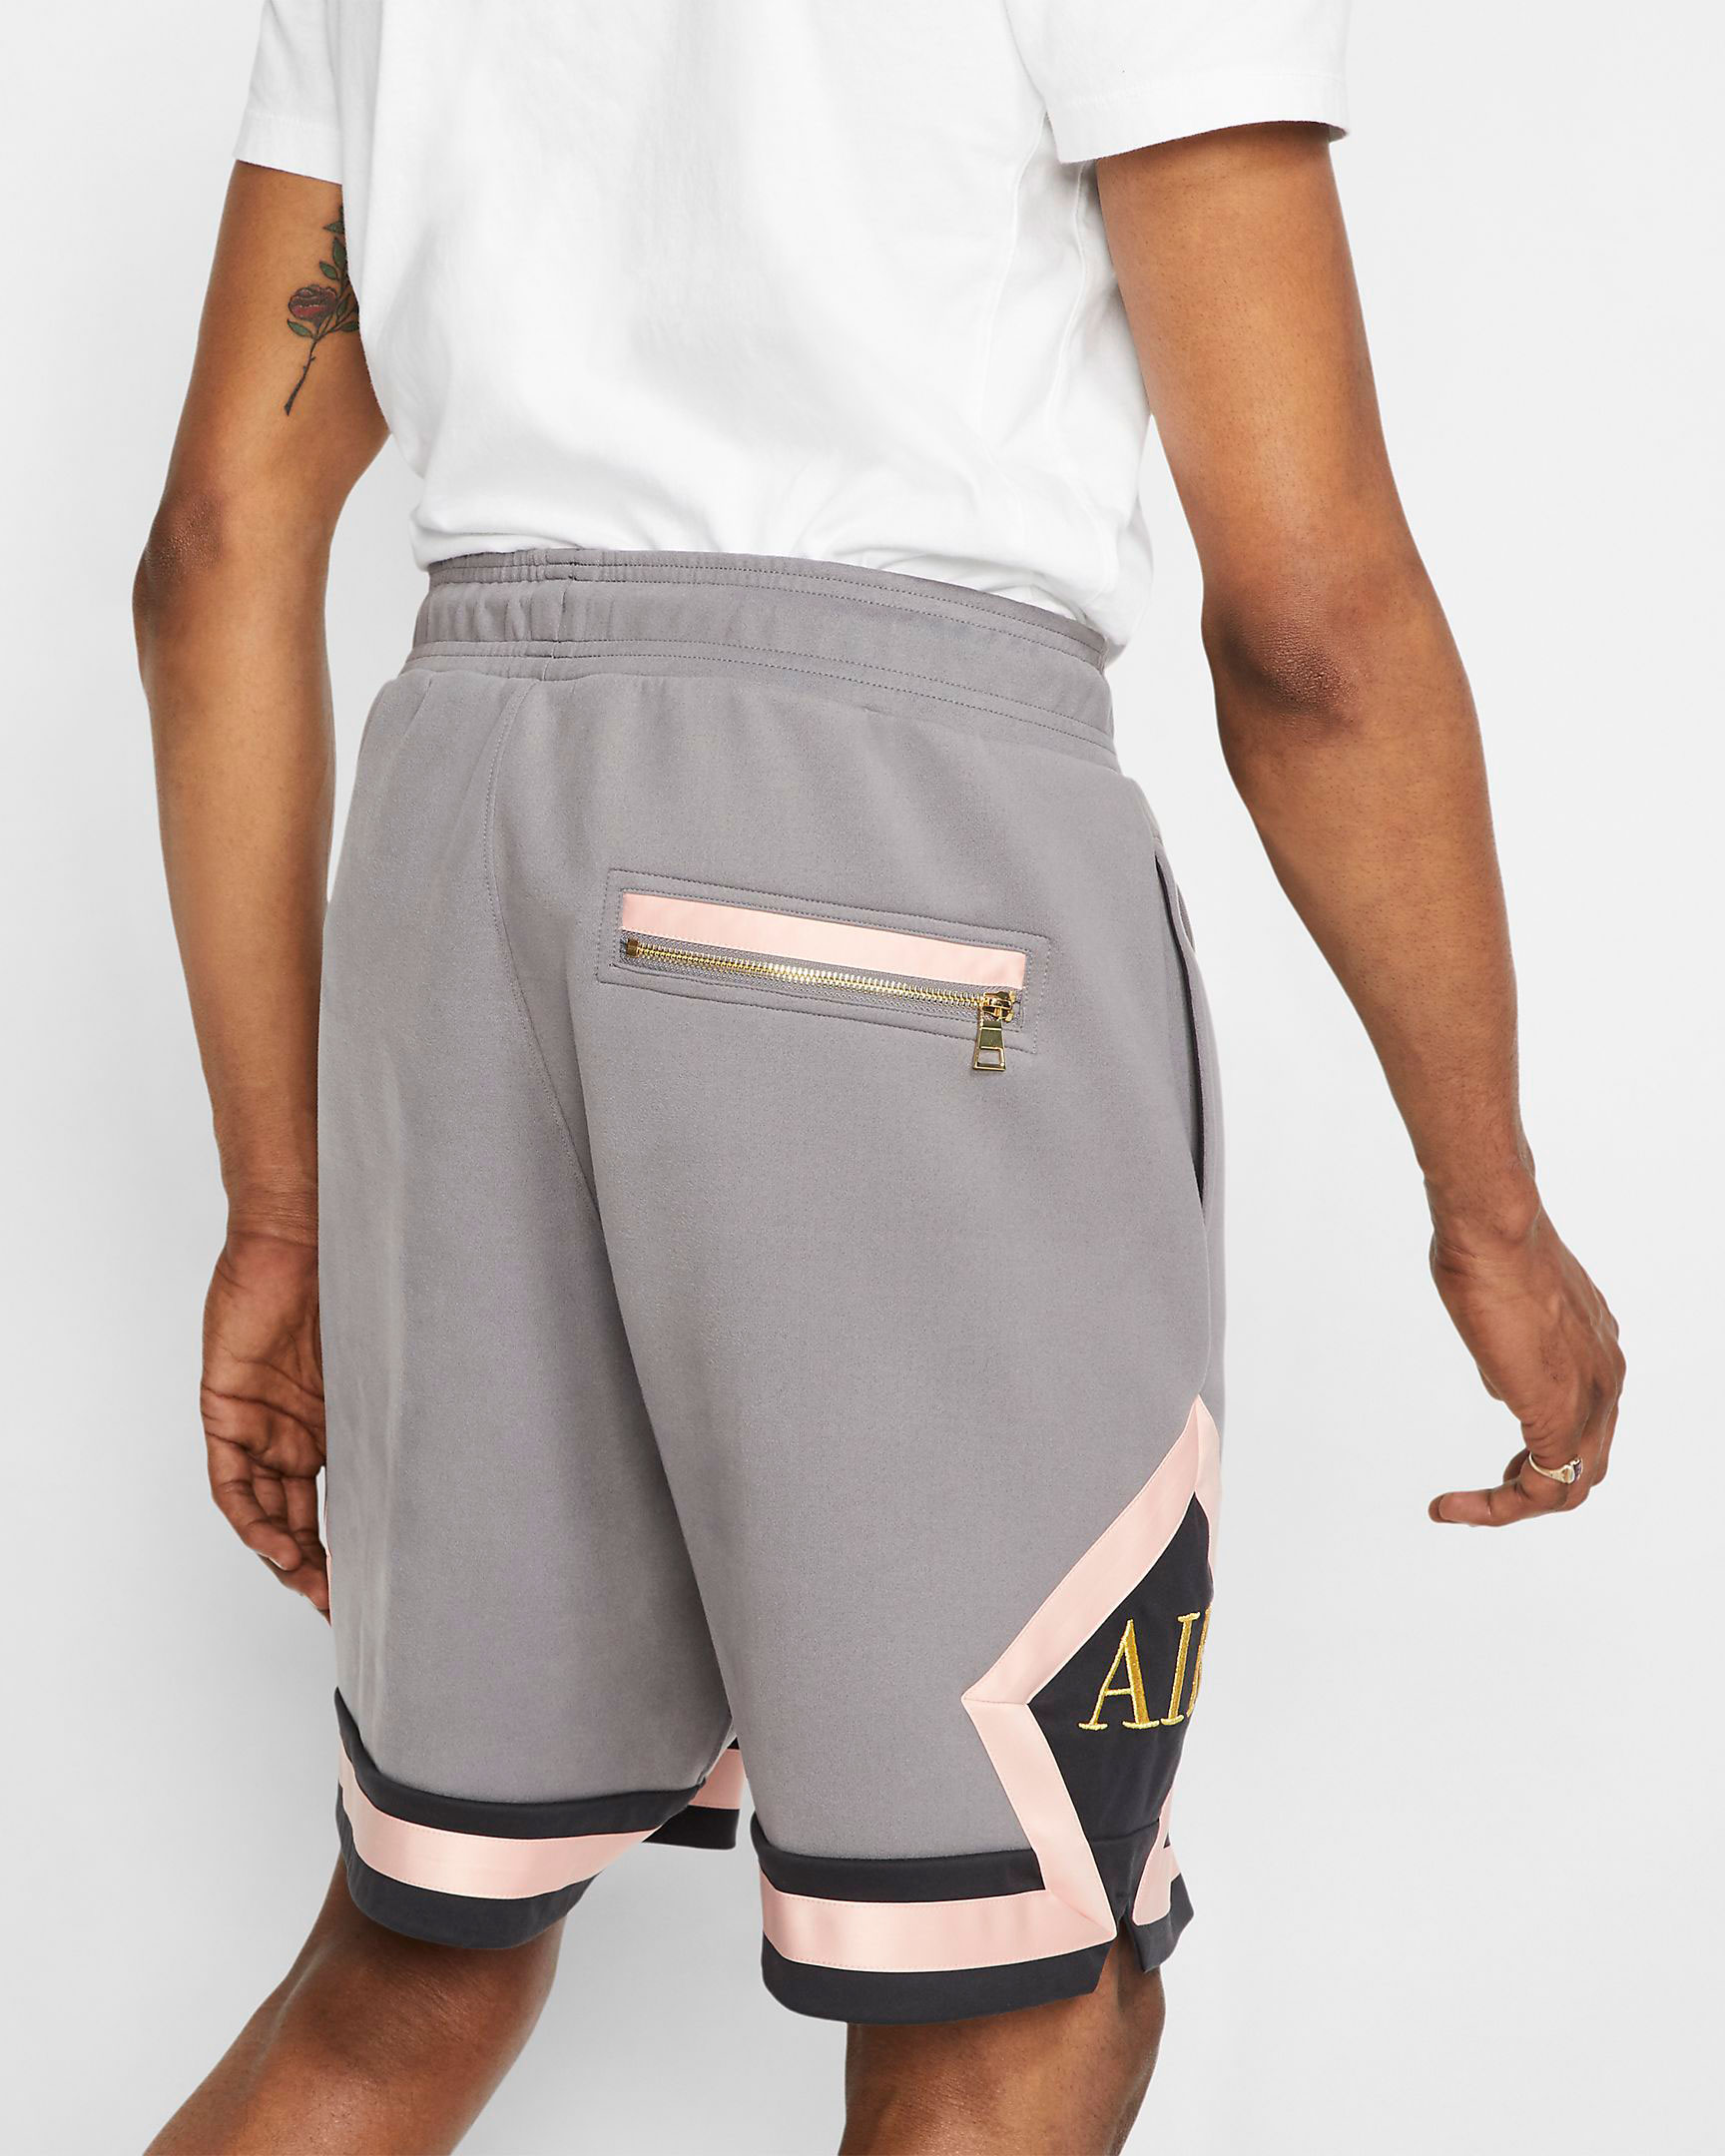 jordan-remastered-diamond-shorts-grey-pink-3